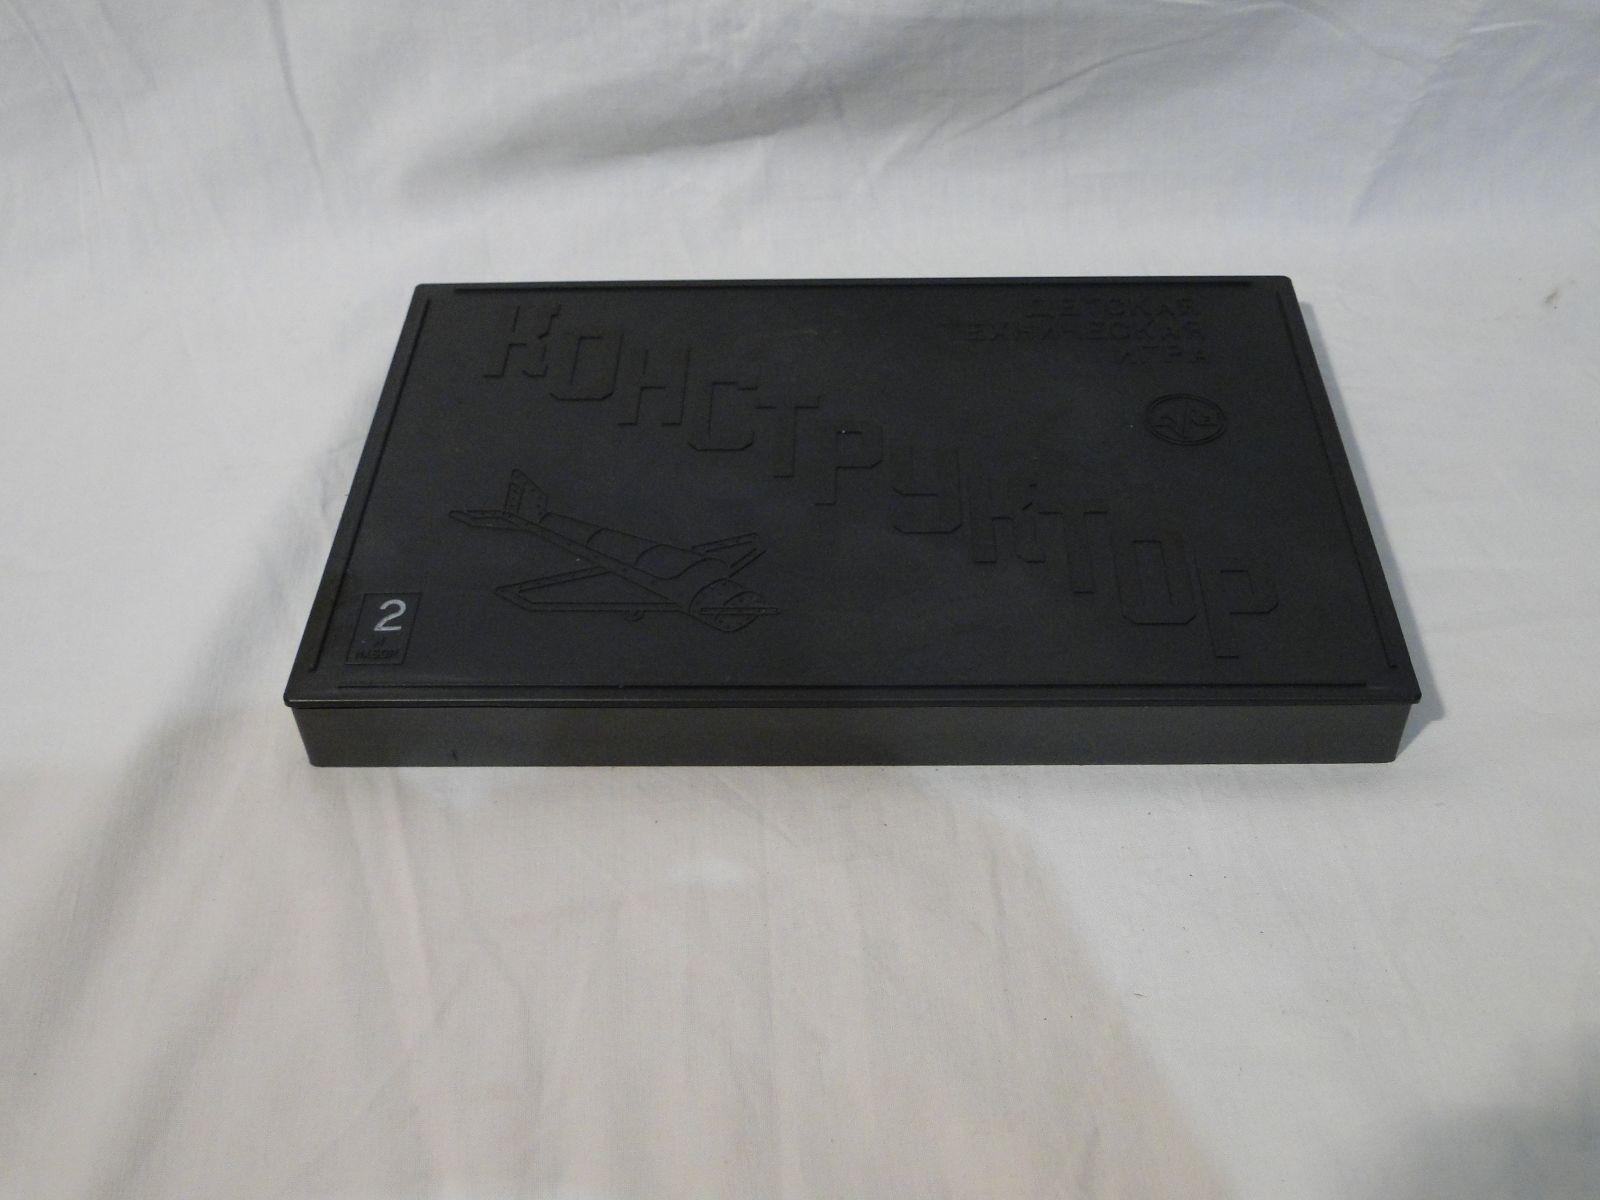 DSC06189.JPG (1600×1200)